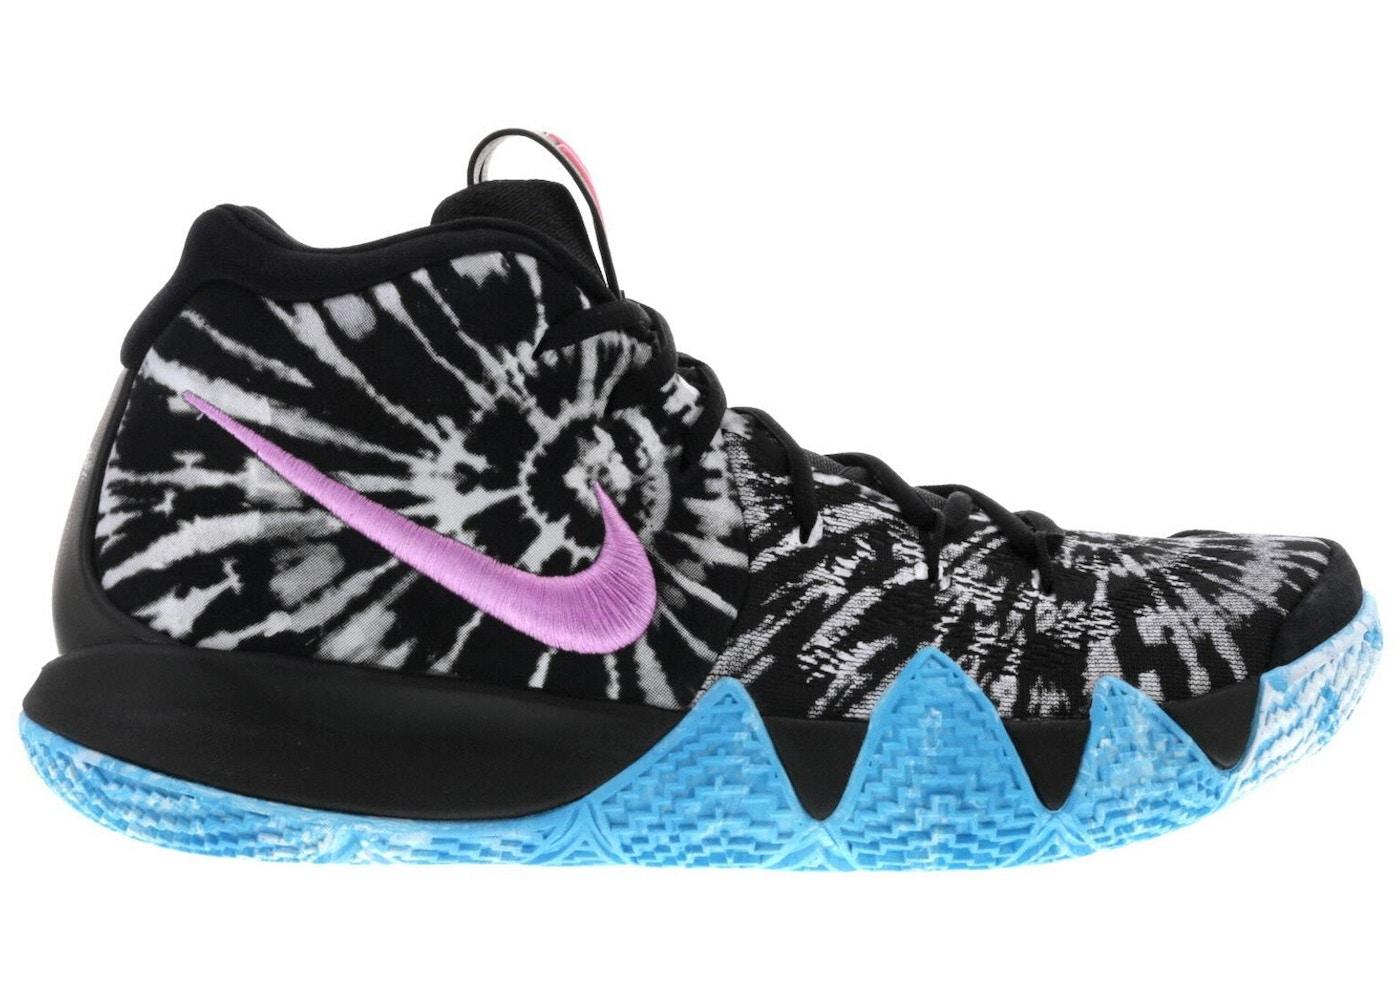 580e3eb69ec3 Nike Basketball Shoes - New Highest Bids